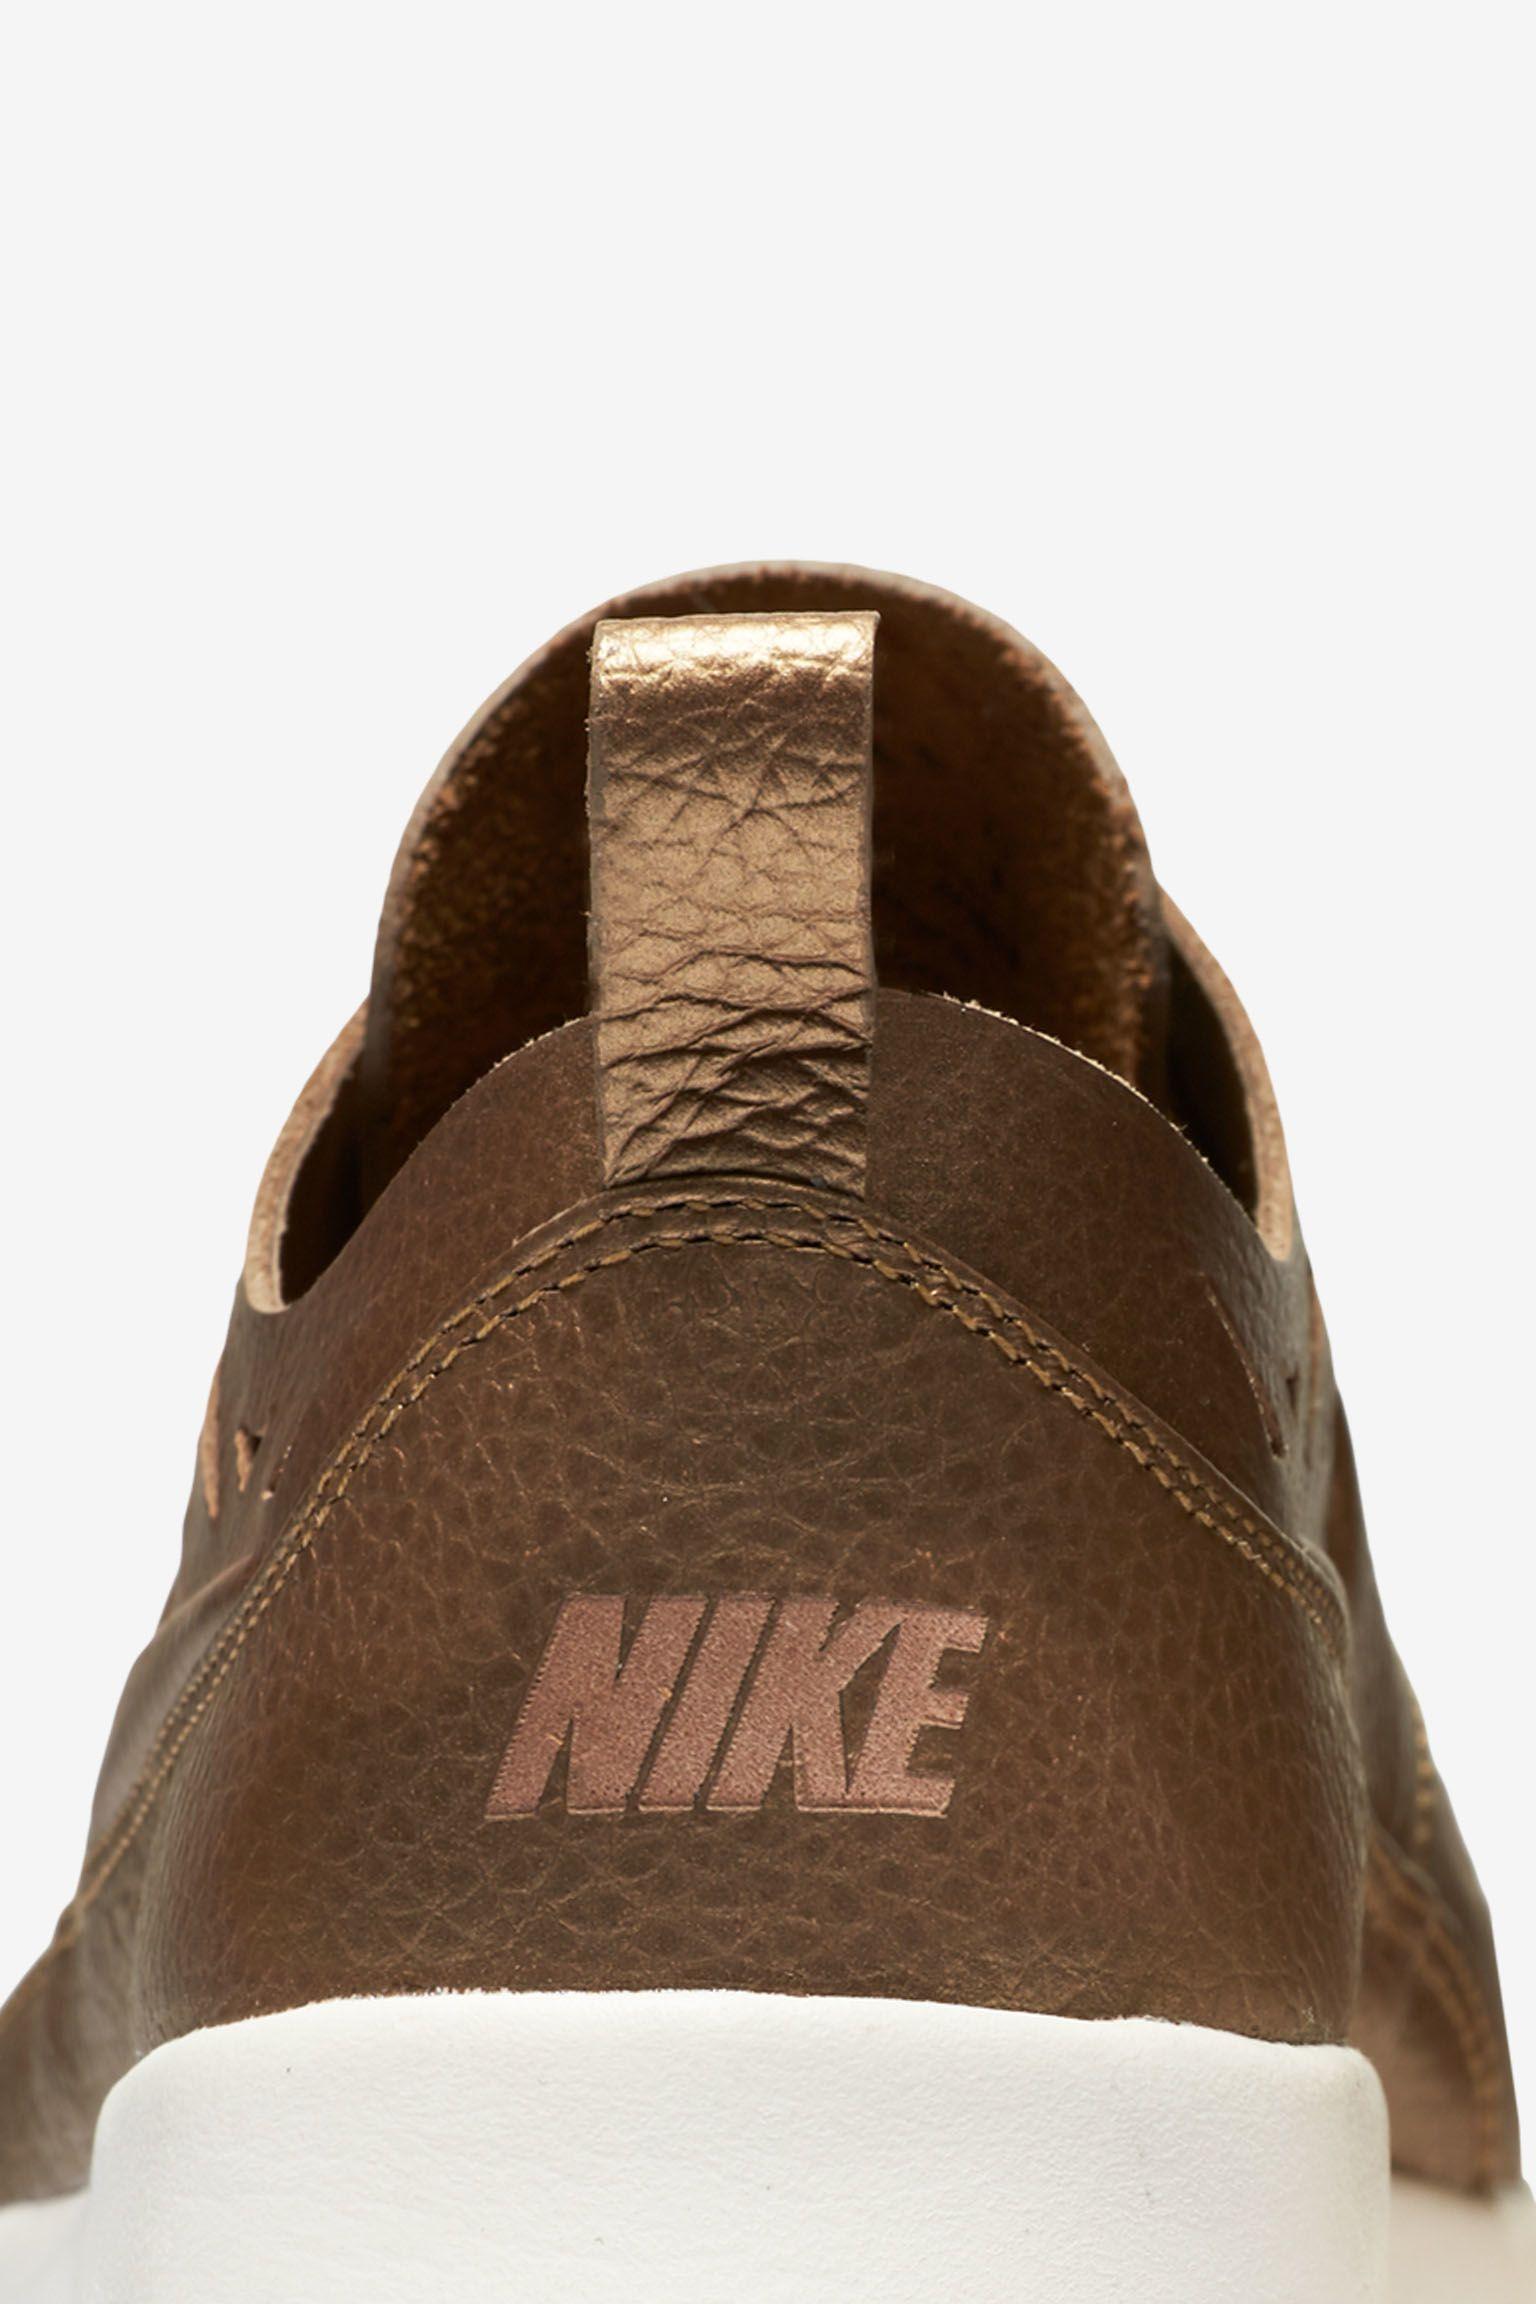 Women's Nike Air Max Thea Joli 'Metallic Golden Tan'